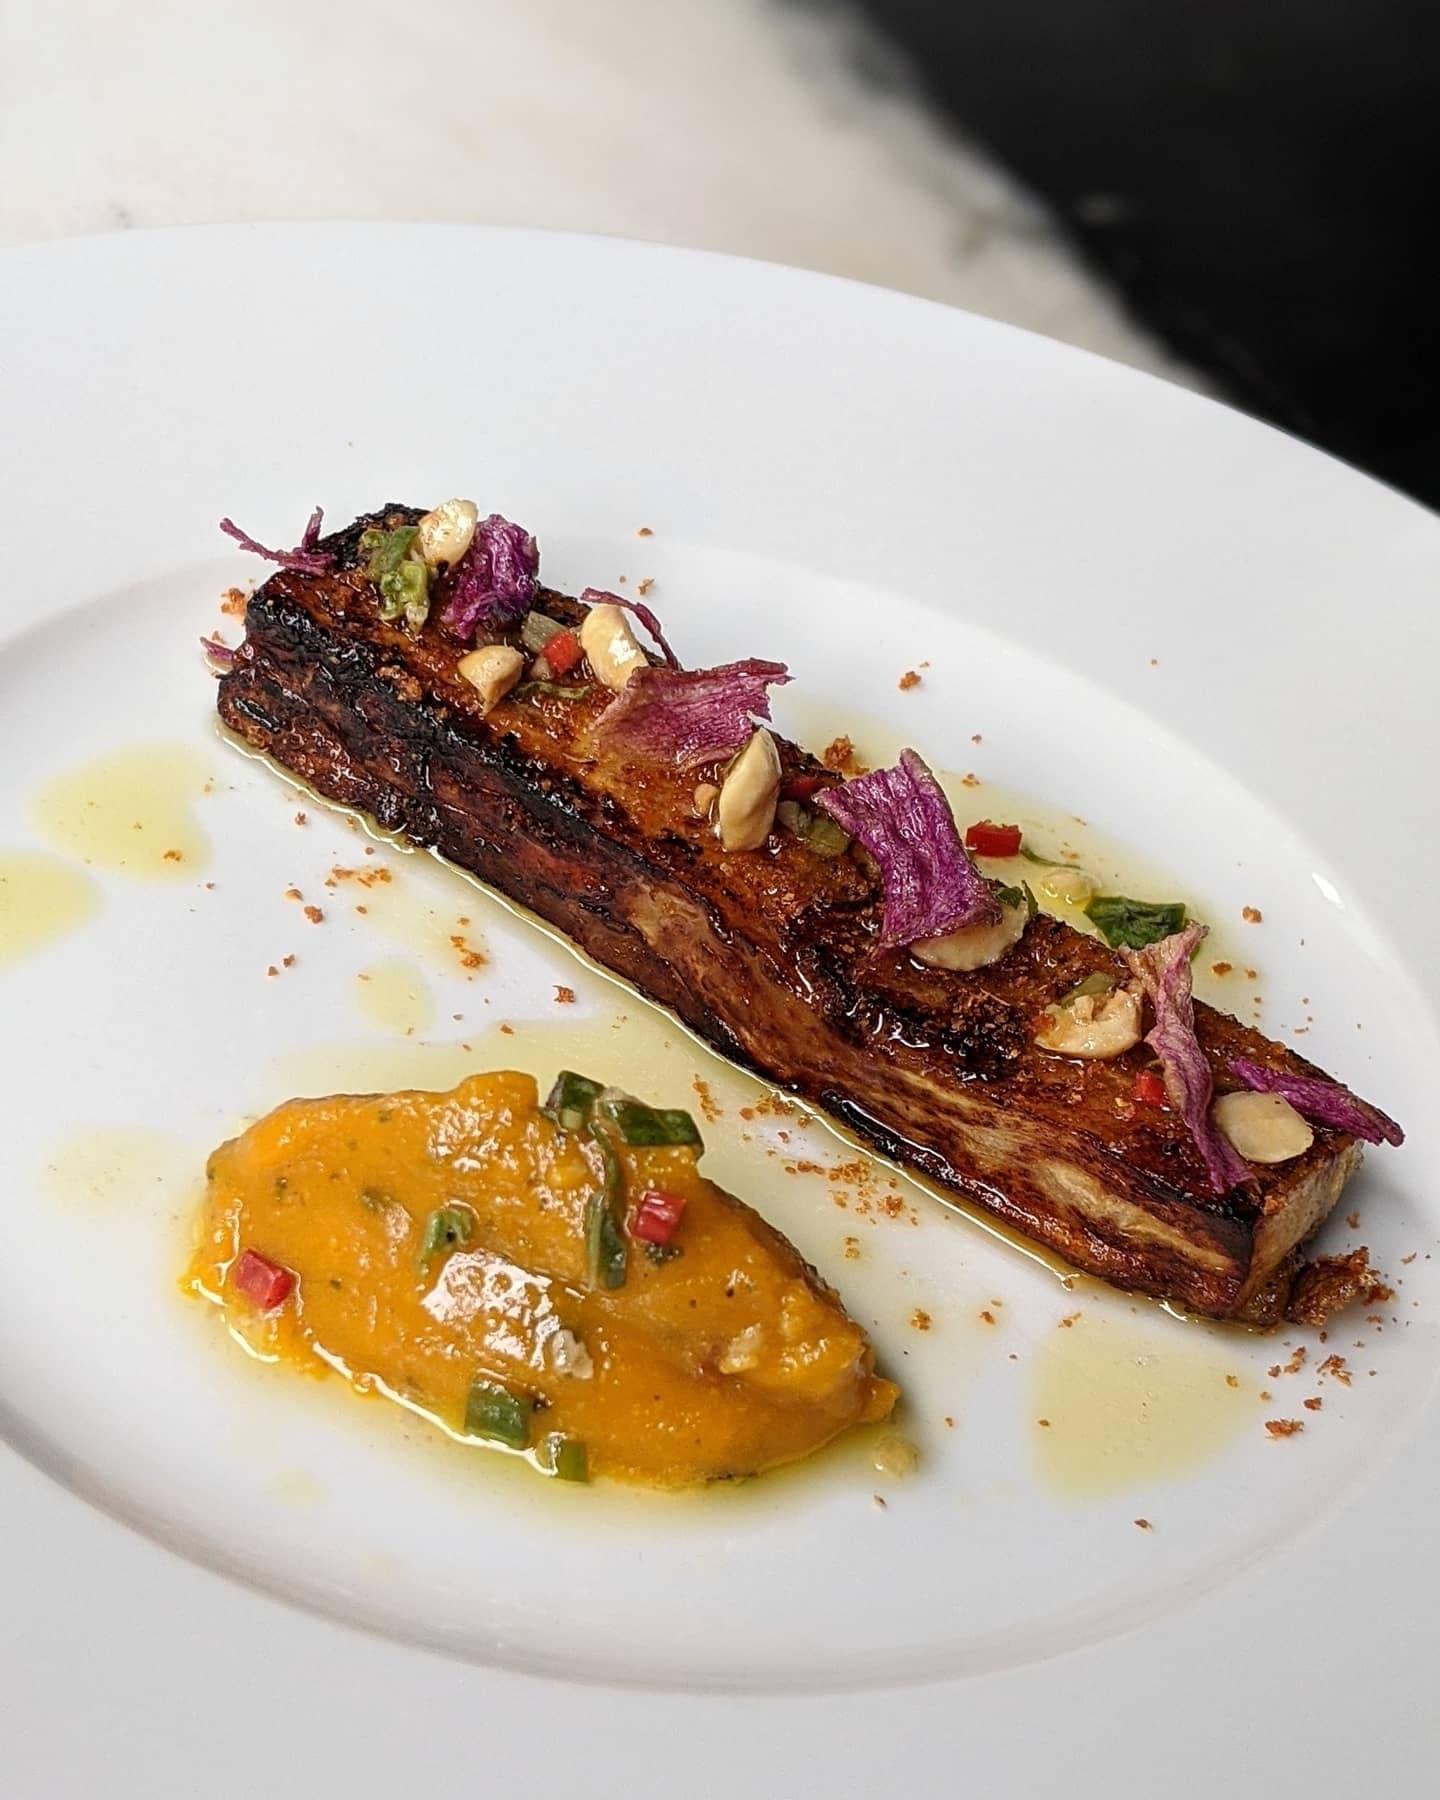 Aubergine compressed with vegan dashi, part of a vegan menu at Angelina